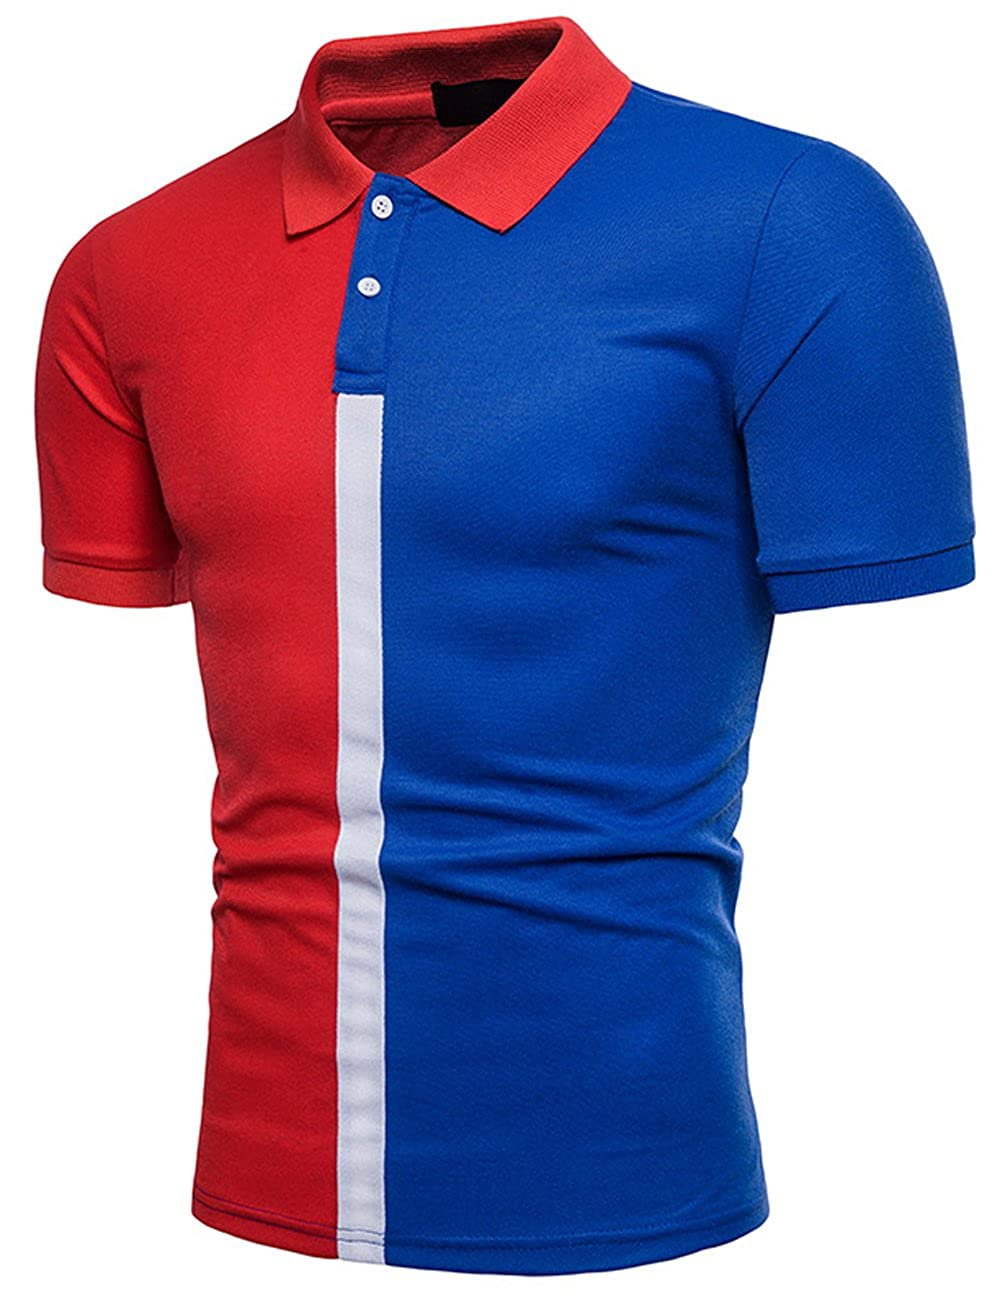 Polo para Hombre Manga Corta Casual Deporte Camisas Cuello Contraste Tennis